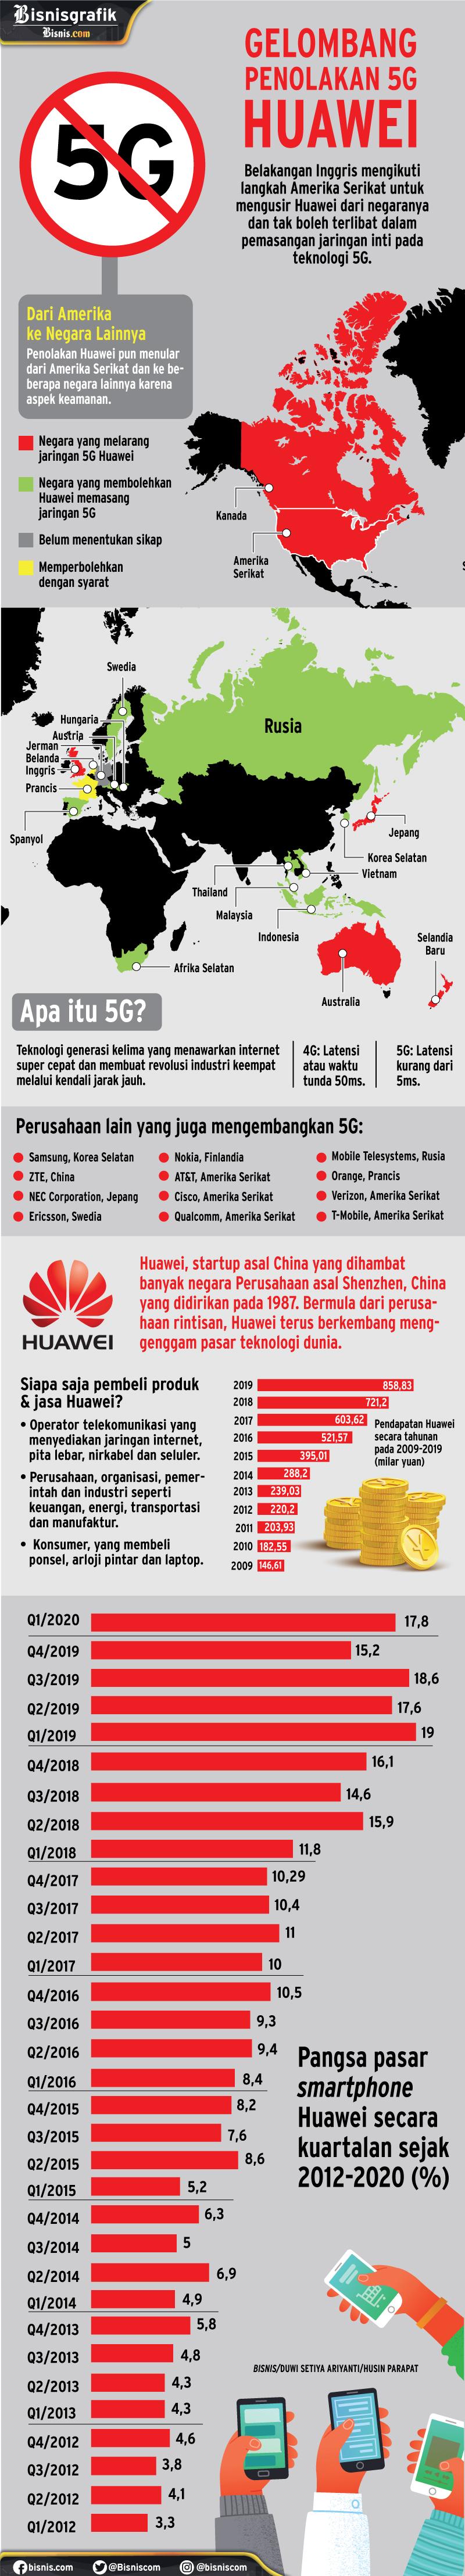 Gelombang penolakan Huawei. Data oleh Duwi Setiya Ariyanti; Sumber: Bloomberg, BBC, GreyB Services, World Economic Forum; Ilustrasi oleh Husin Parapat